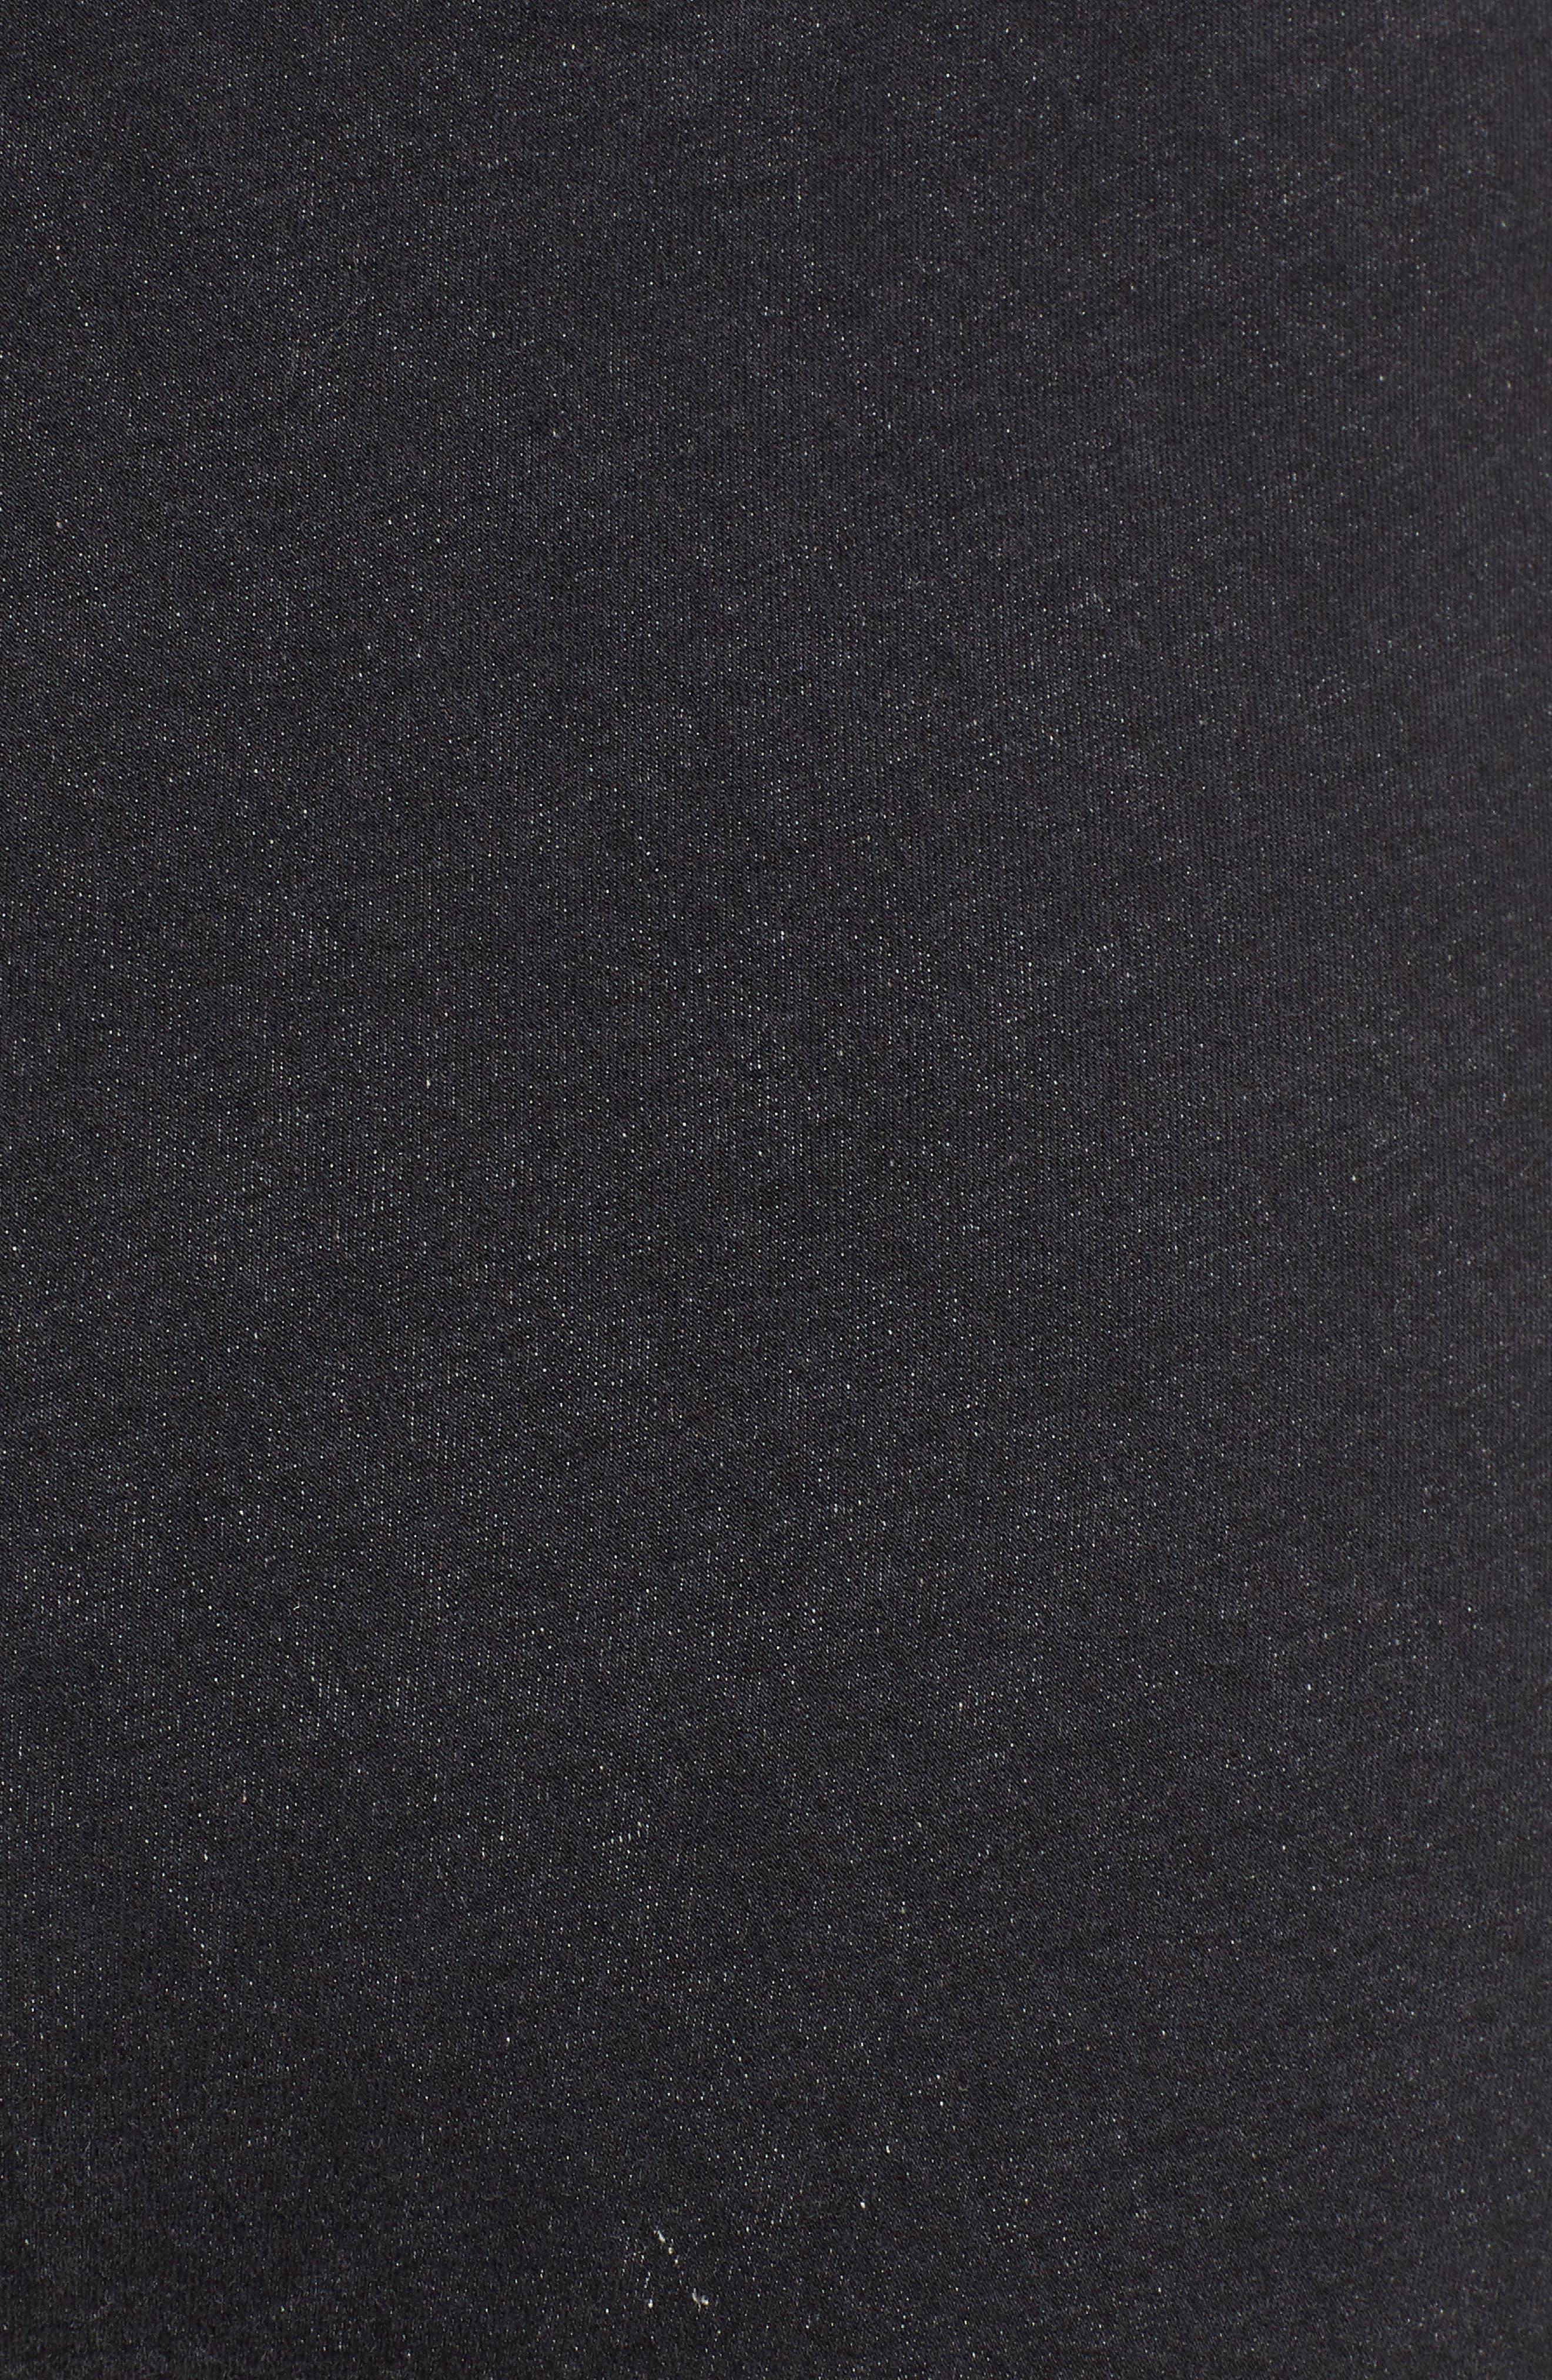 Studded High Waist Denim Leggings,                             Alternate thumbnail 6, color,                             DARK GREY WASH